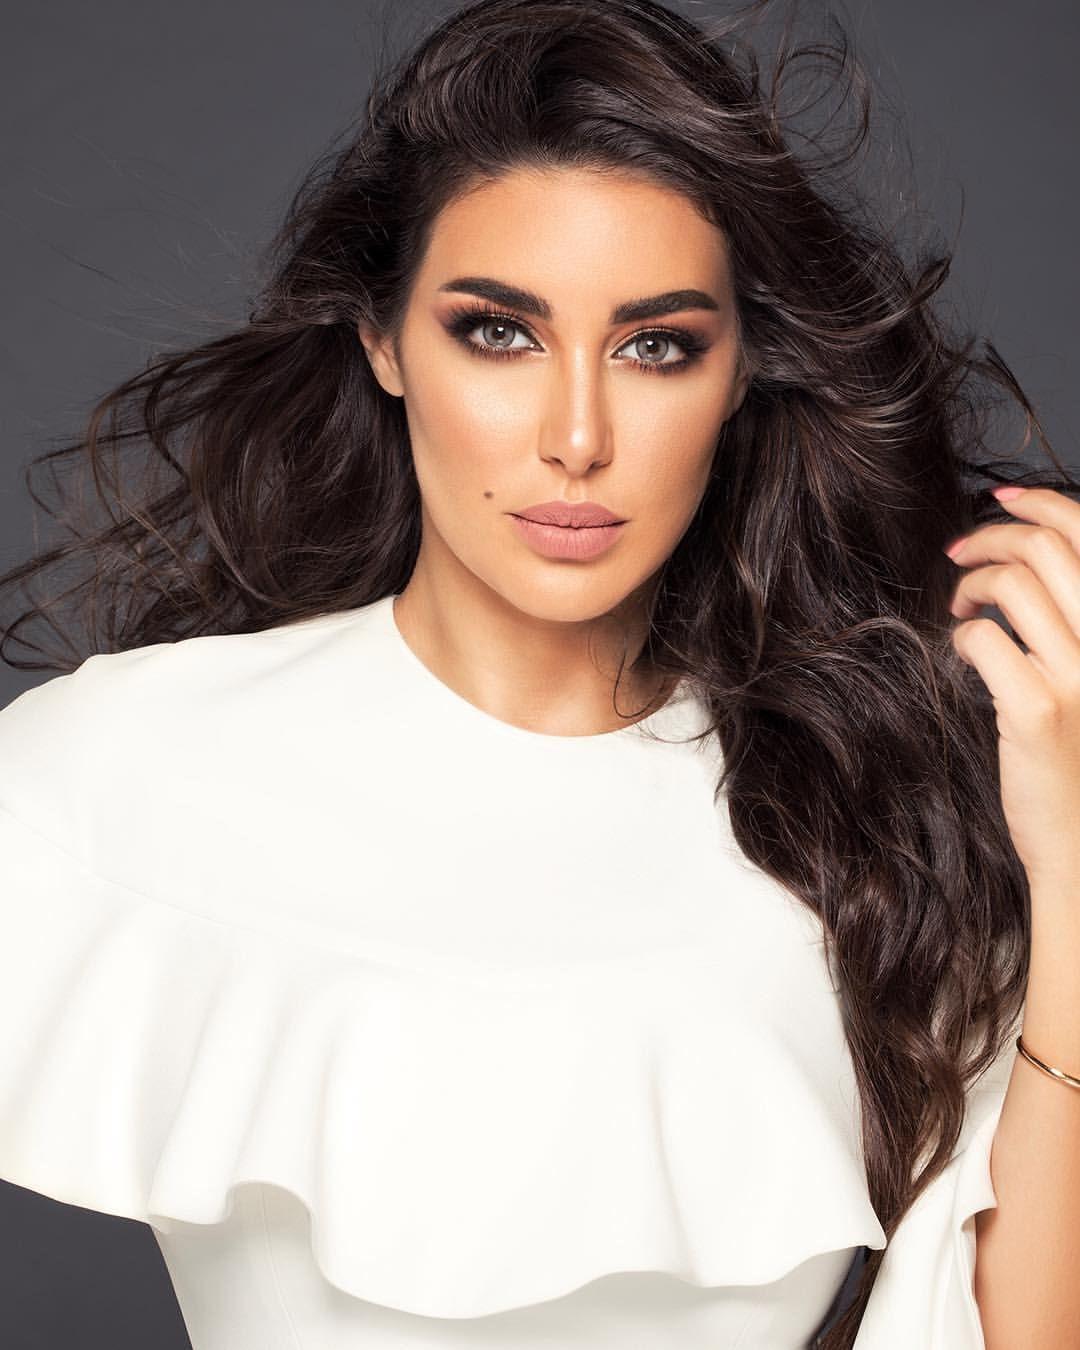 عدسات لنس مي مست Arab Celebrities Beauty Arab Actress